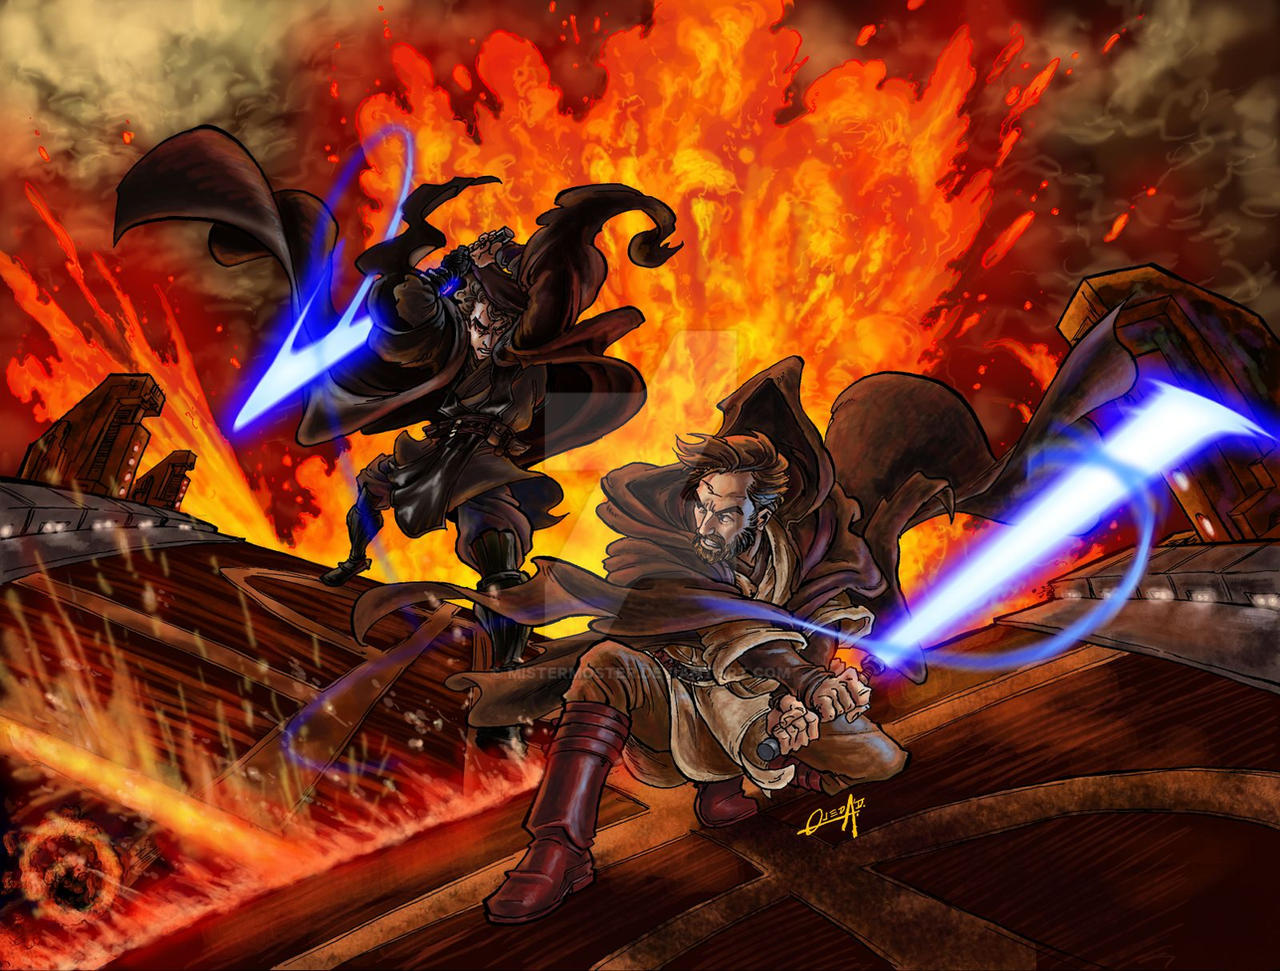 Obi-wan vs Anakin by mistermoster